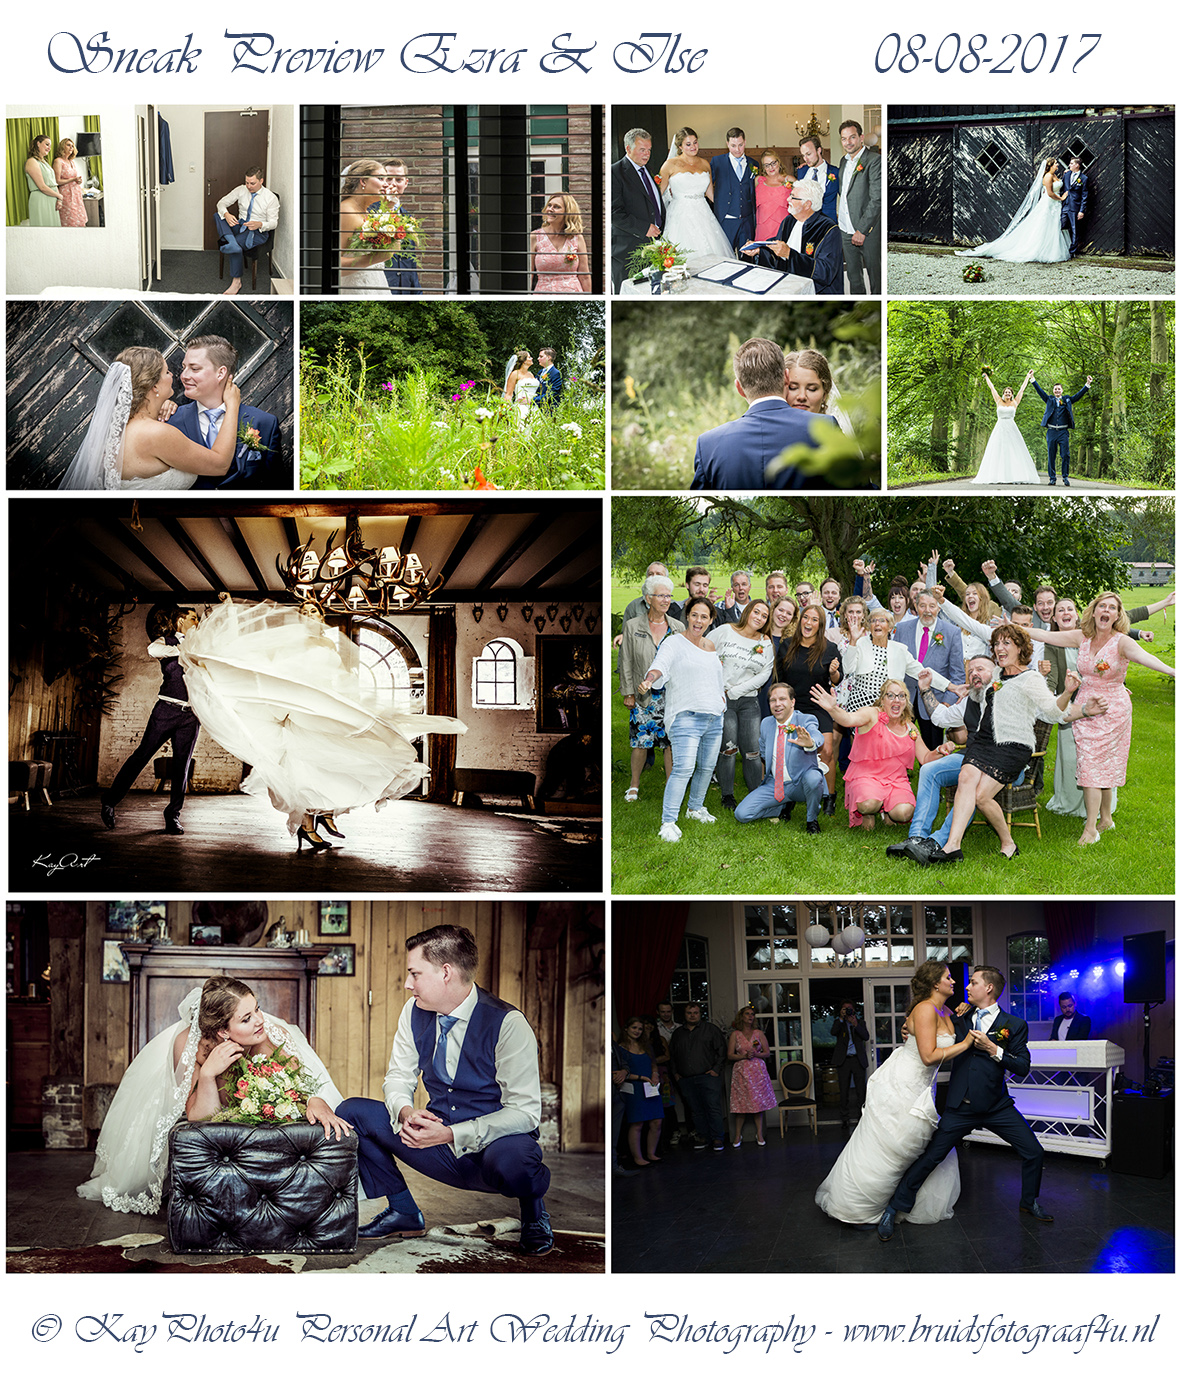 trouwfoto's marienwaerdt, marienwaerdt, marienwaerdt beesd, beesd, trouwen marienwaerdt, trouwreportage marienwaerdt, trouwfotograaf marienwaerdt, trouwfotograaf beesd, bruidsfotograaf marienwaerdt, kayphoto4u, bruidsfotograaf4u